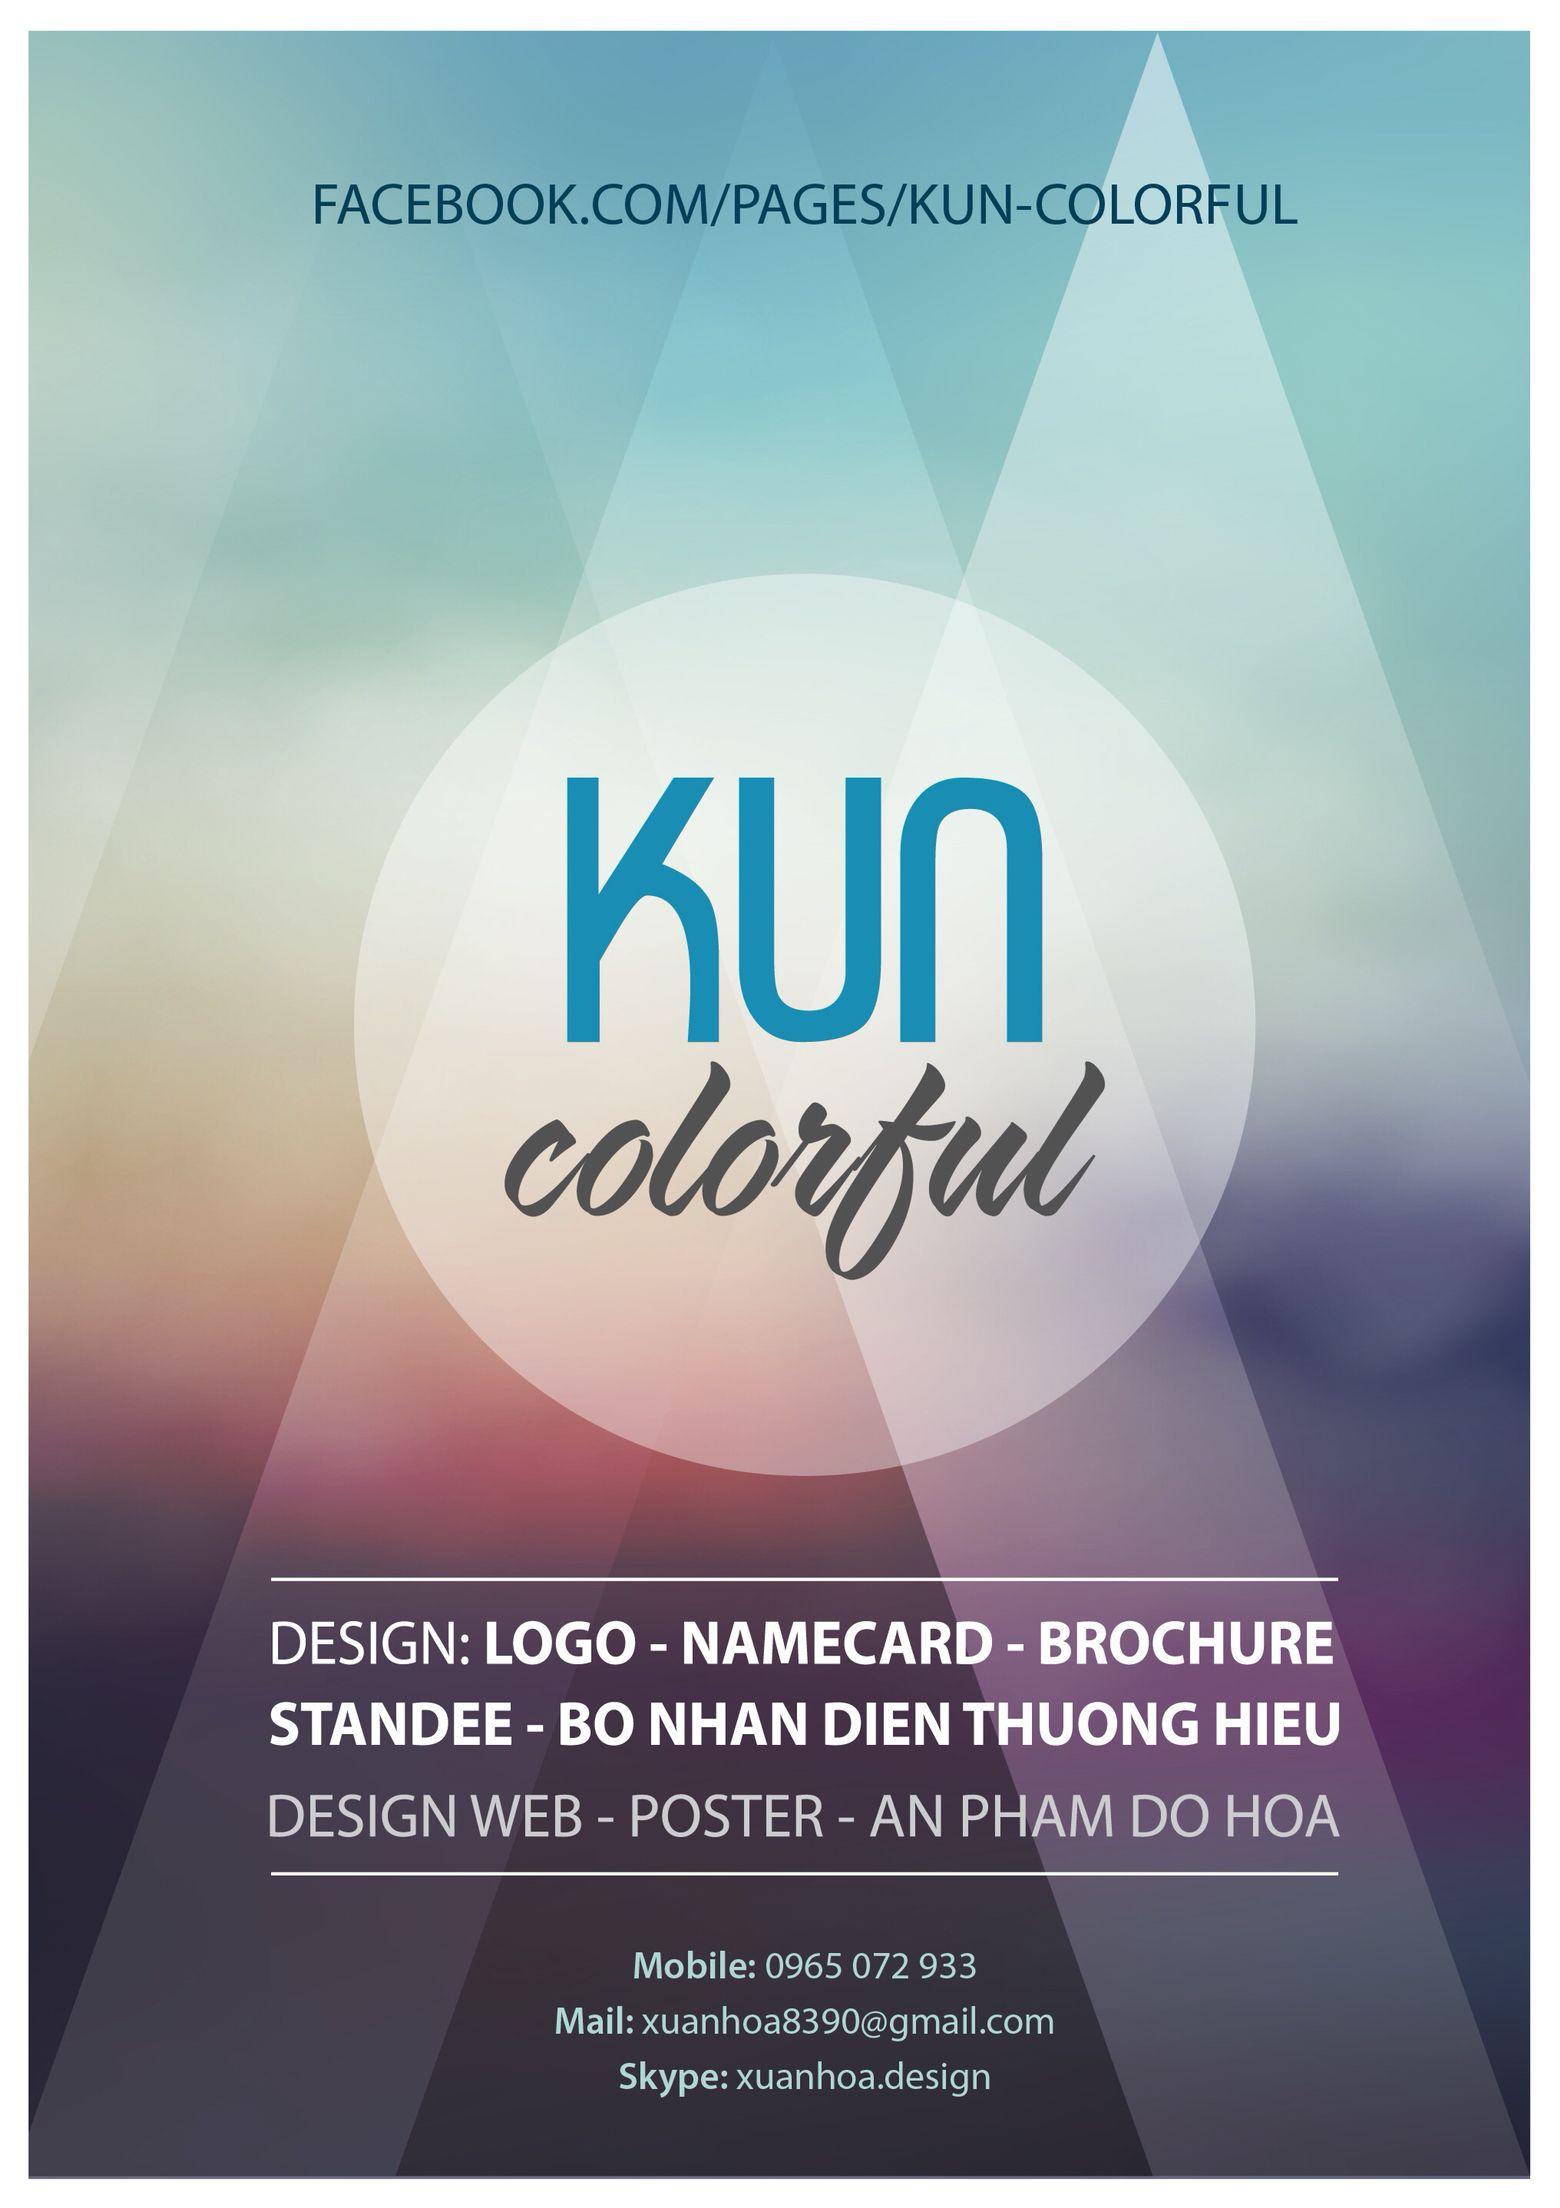 Kun Colorful